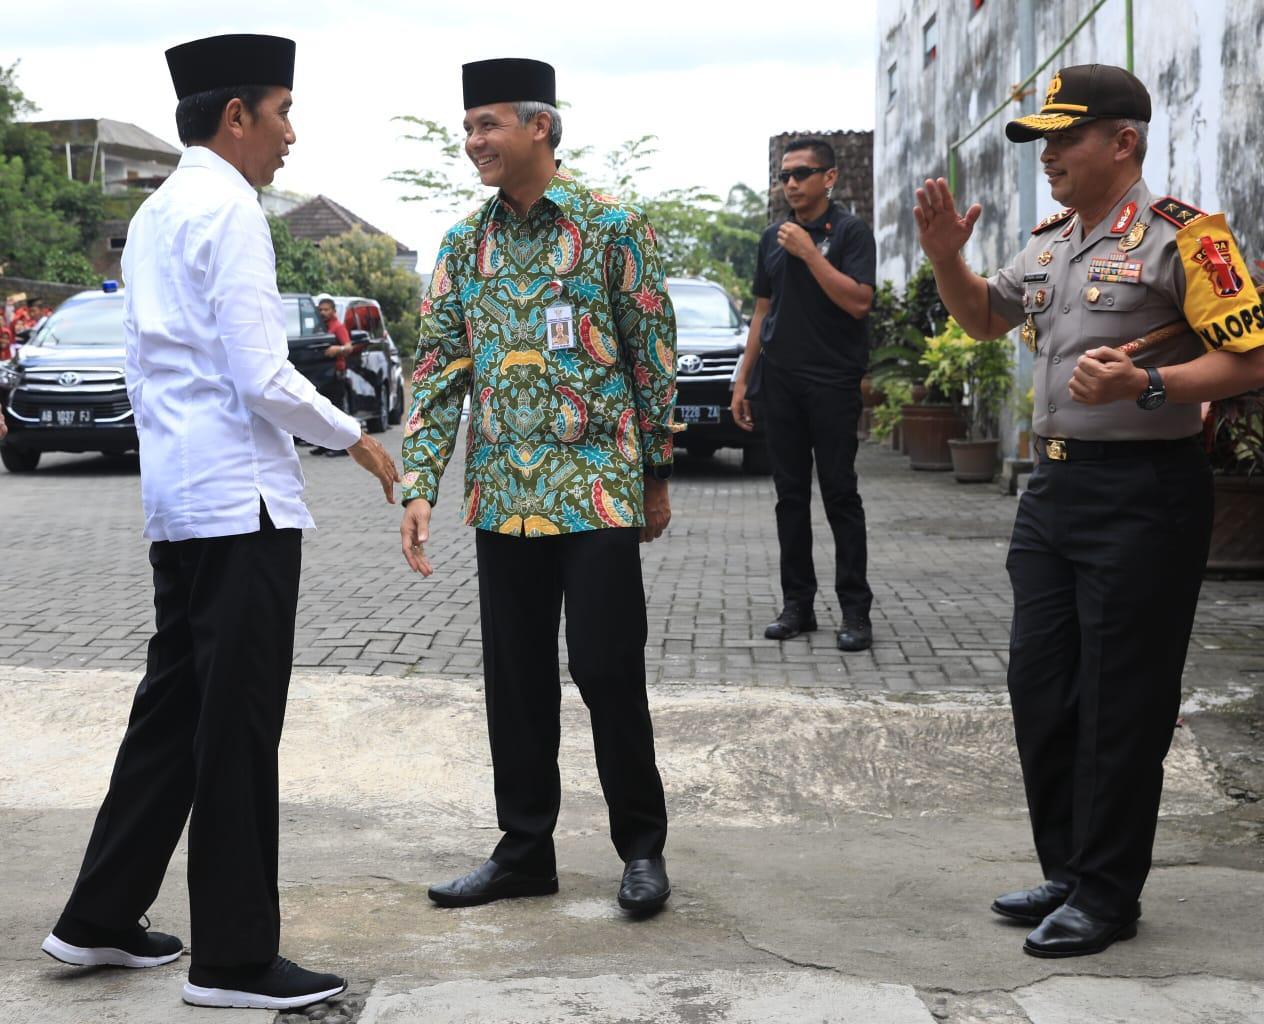 Dipanggil Kyai Oleh Warga Magelang, Jokowi Tersenyum